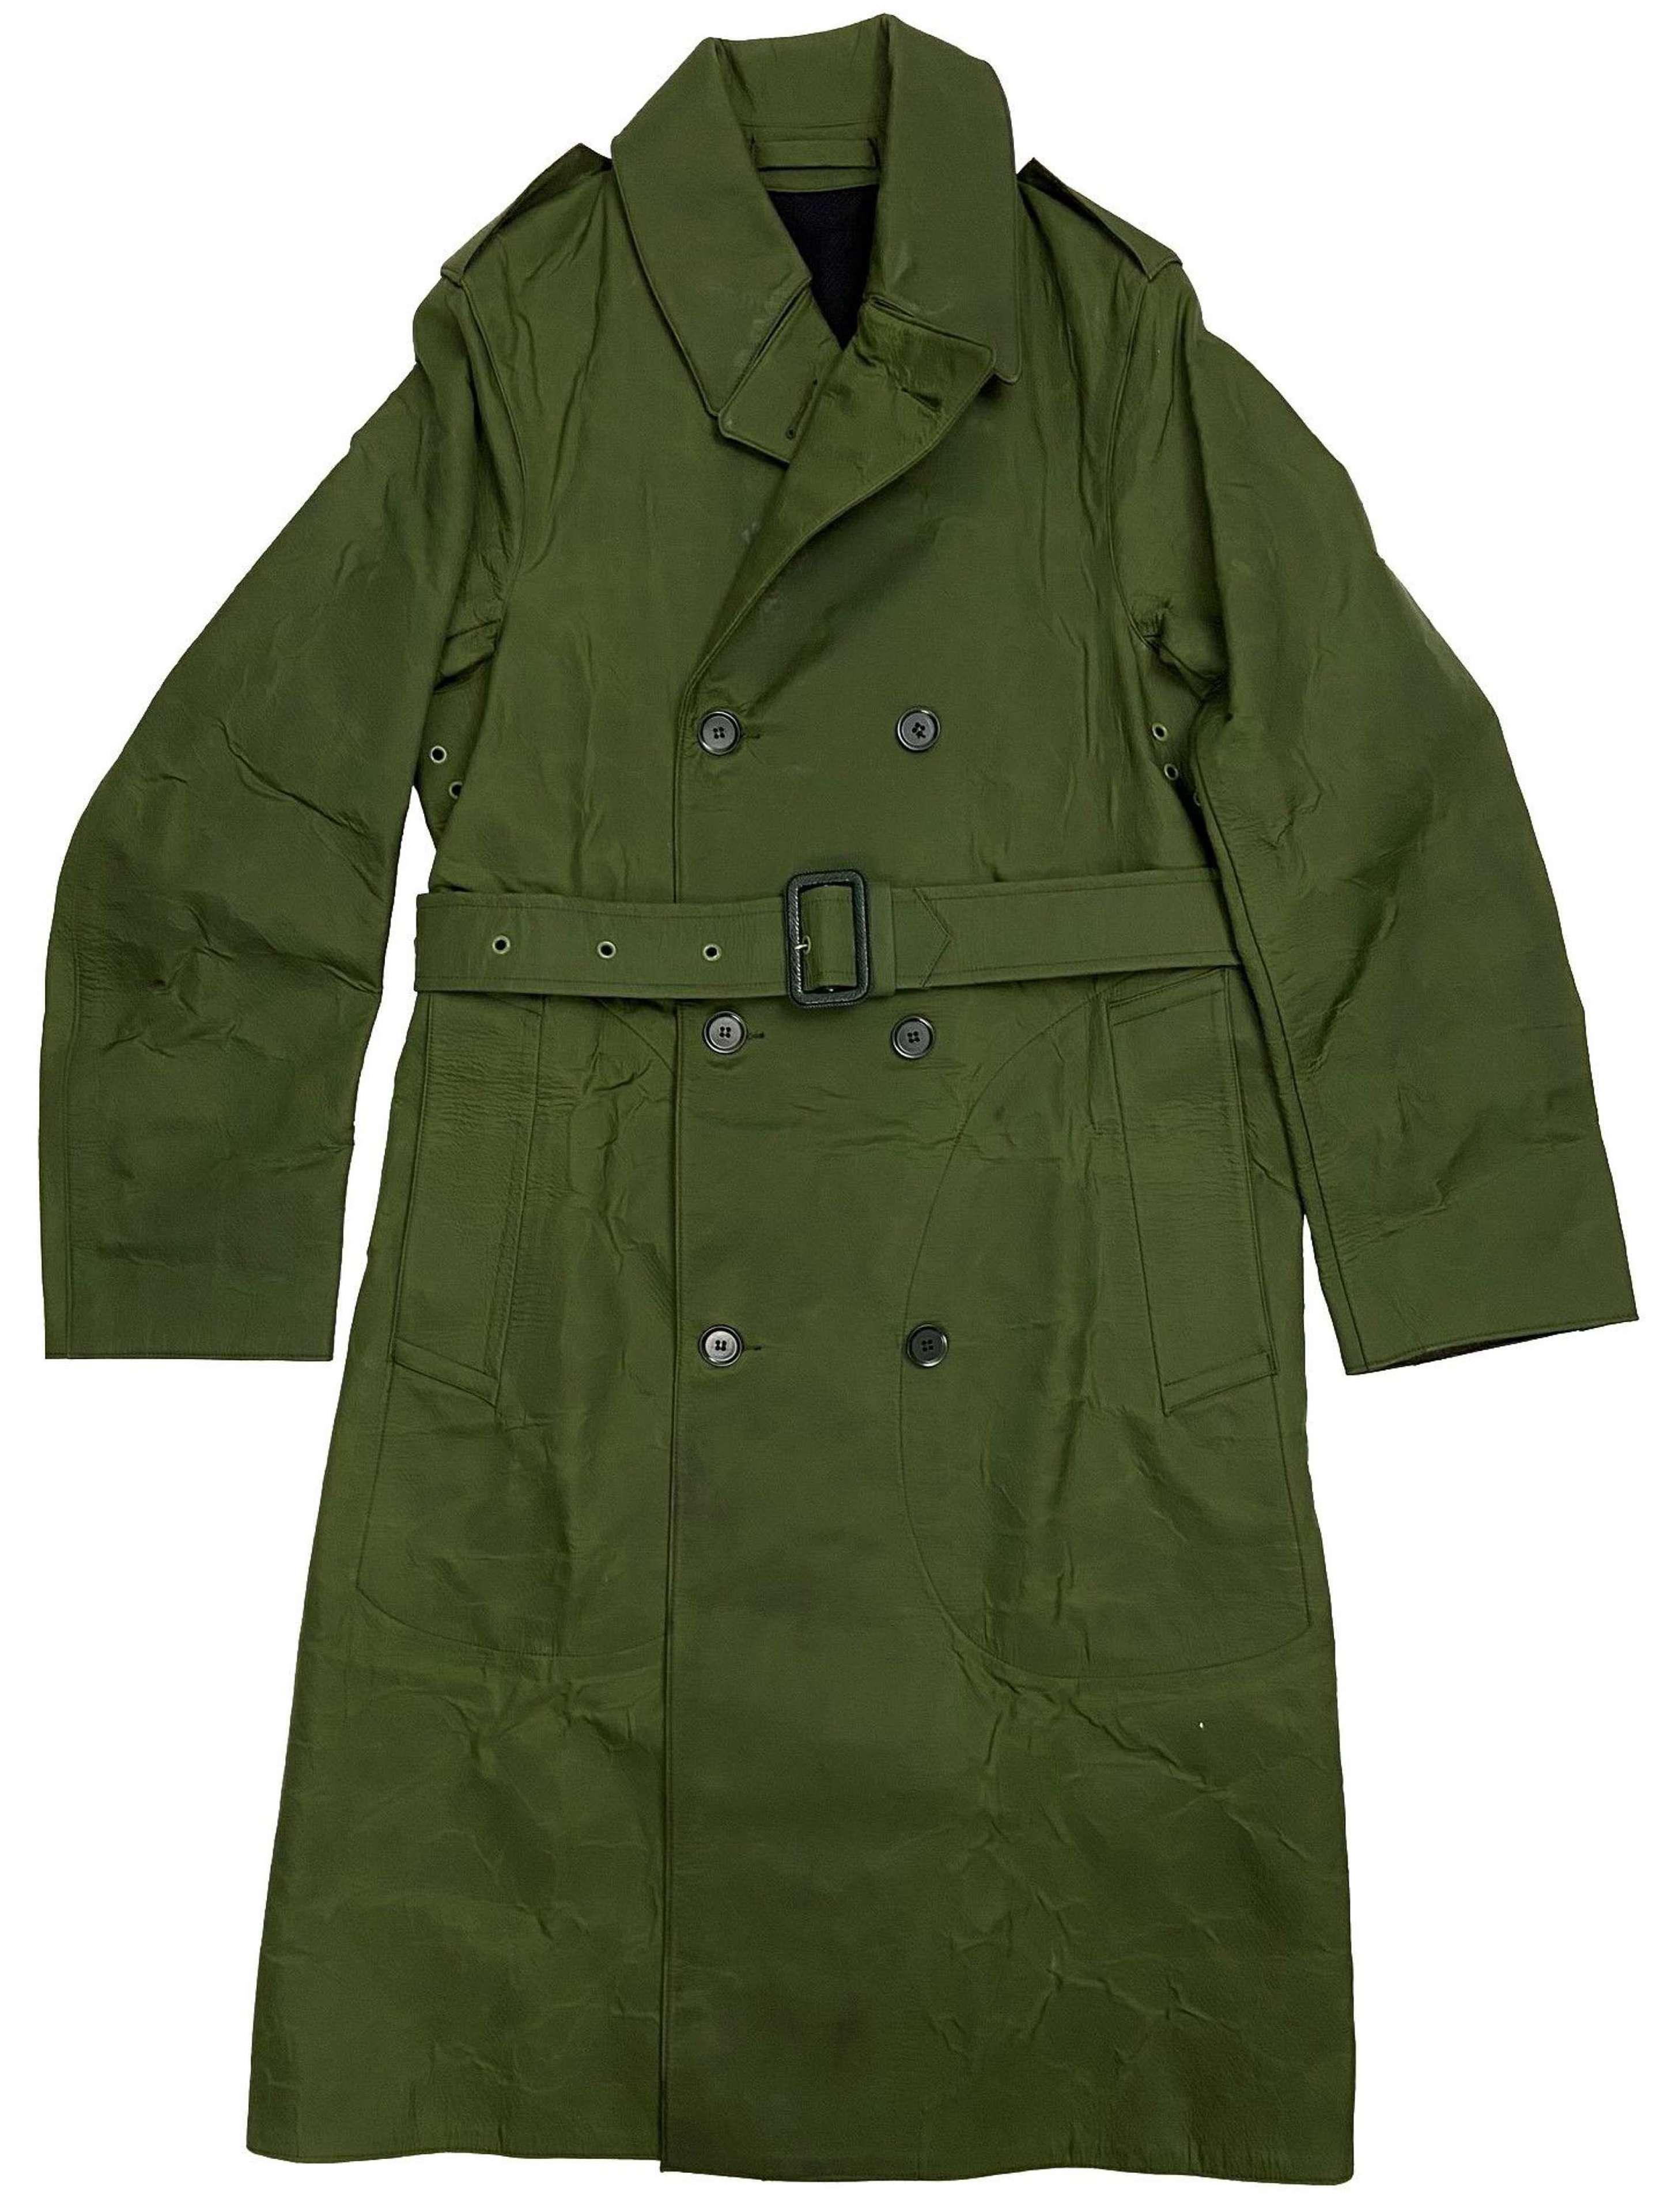 Original 1960s British Army 'Mackintosh Man's RCMP'